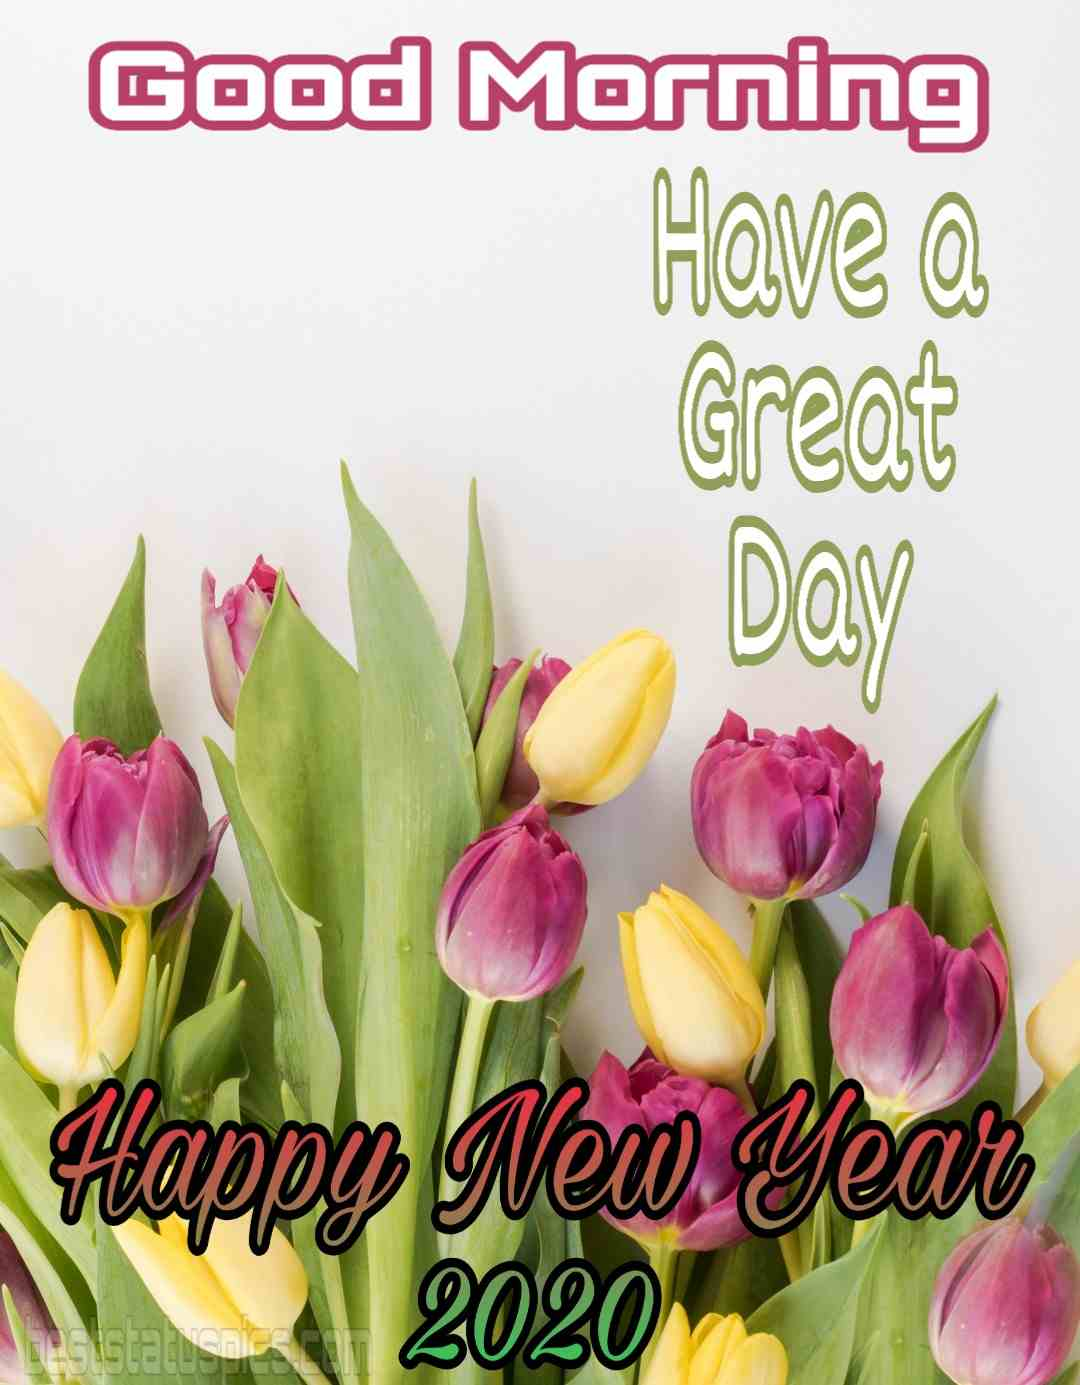 Good morning happy new year's eve 2020 image Whatsapp status